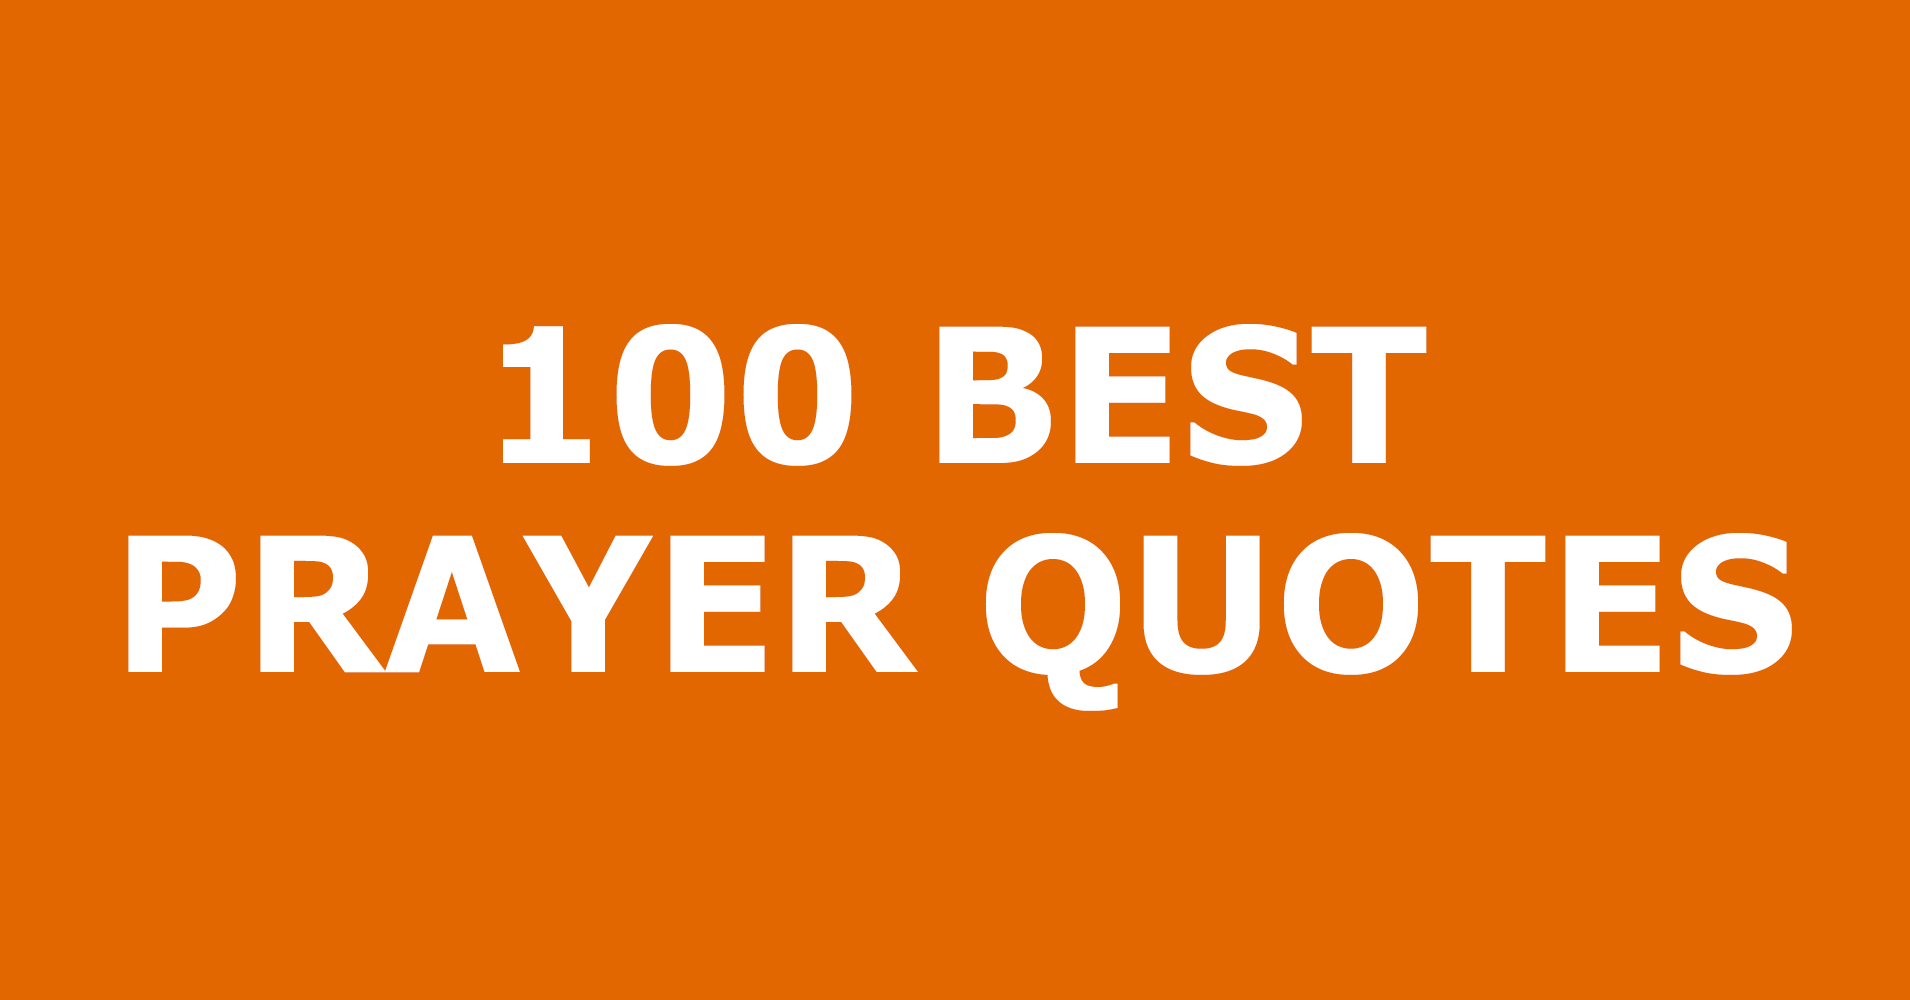 100 Best Prayer Quotes — Trustworthy Word